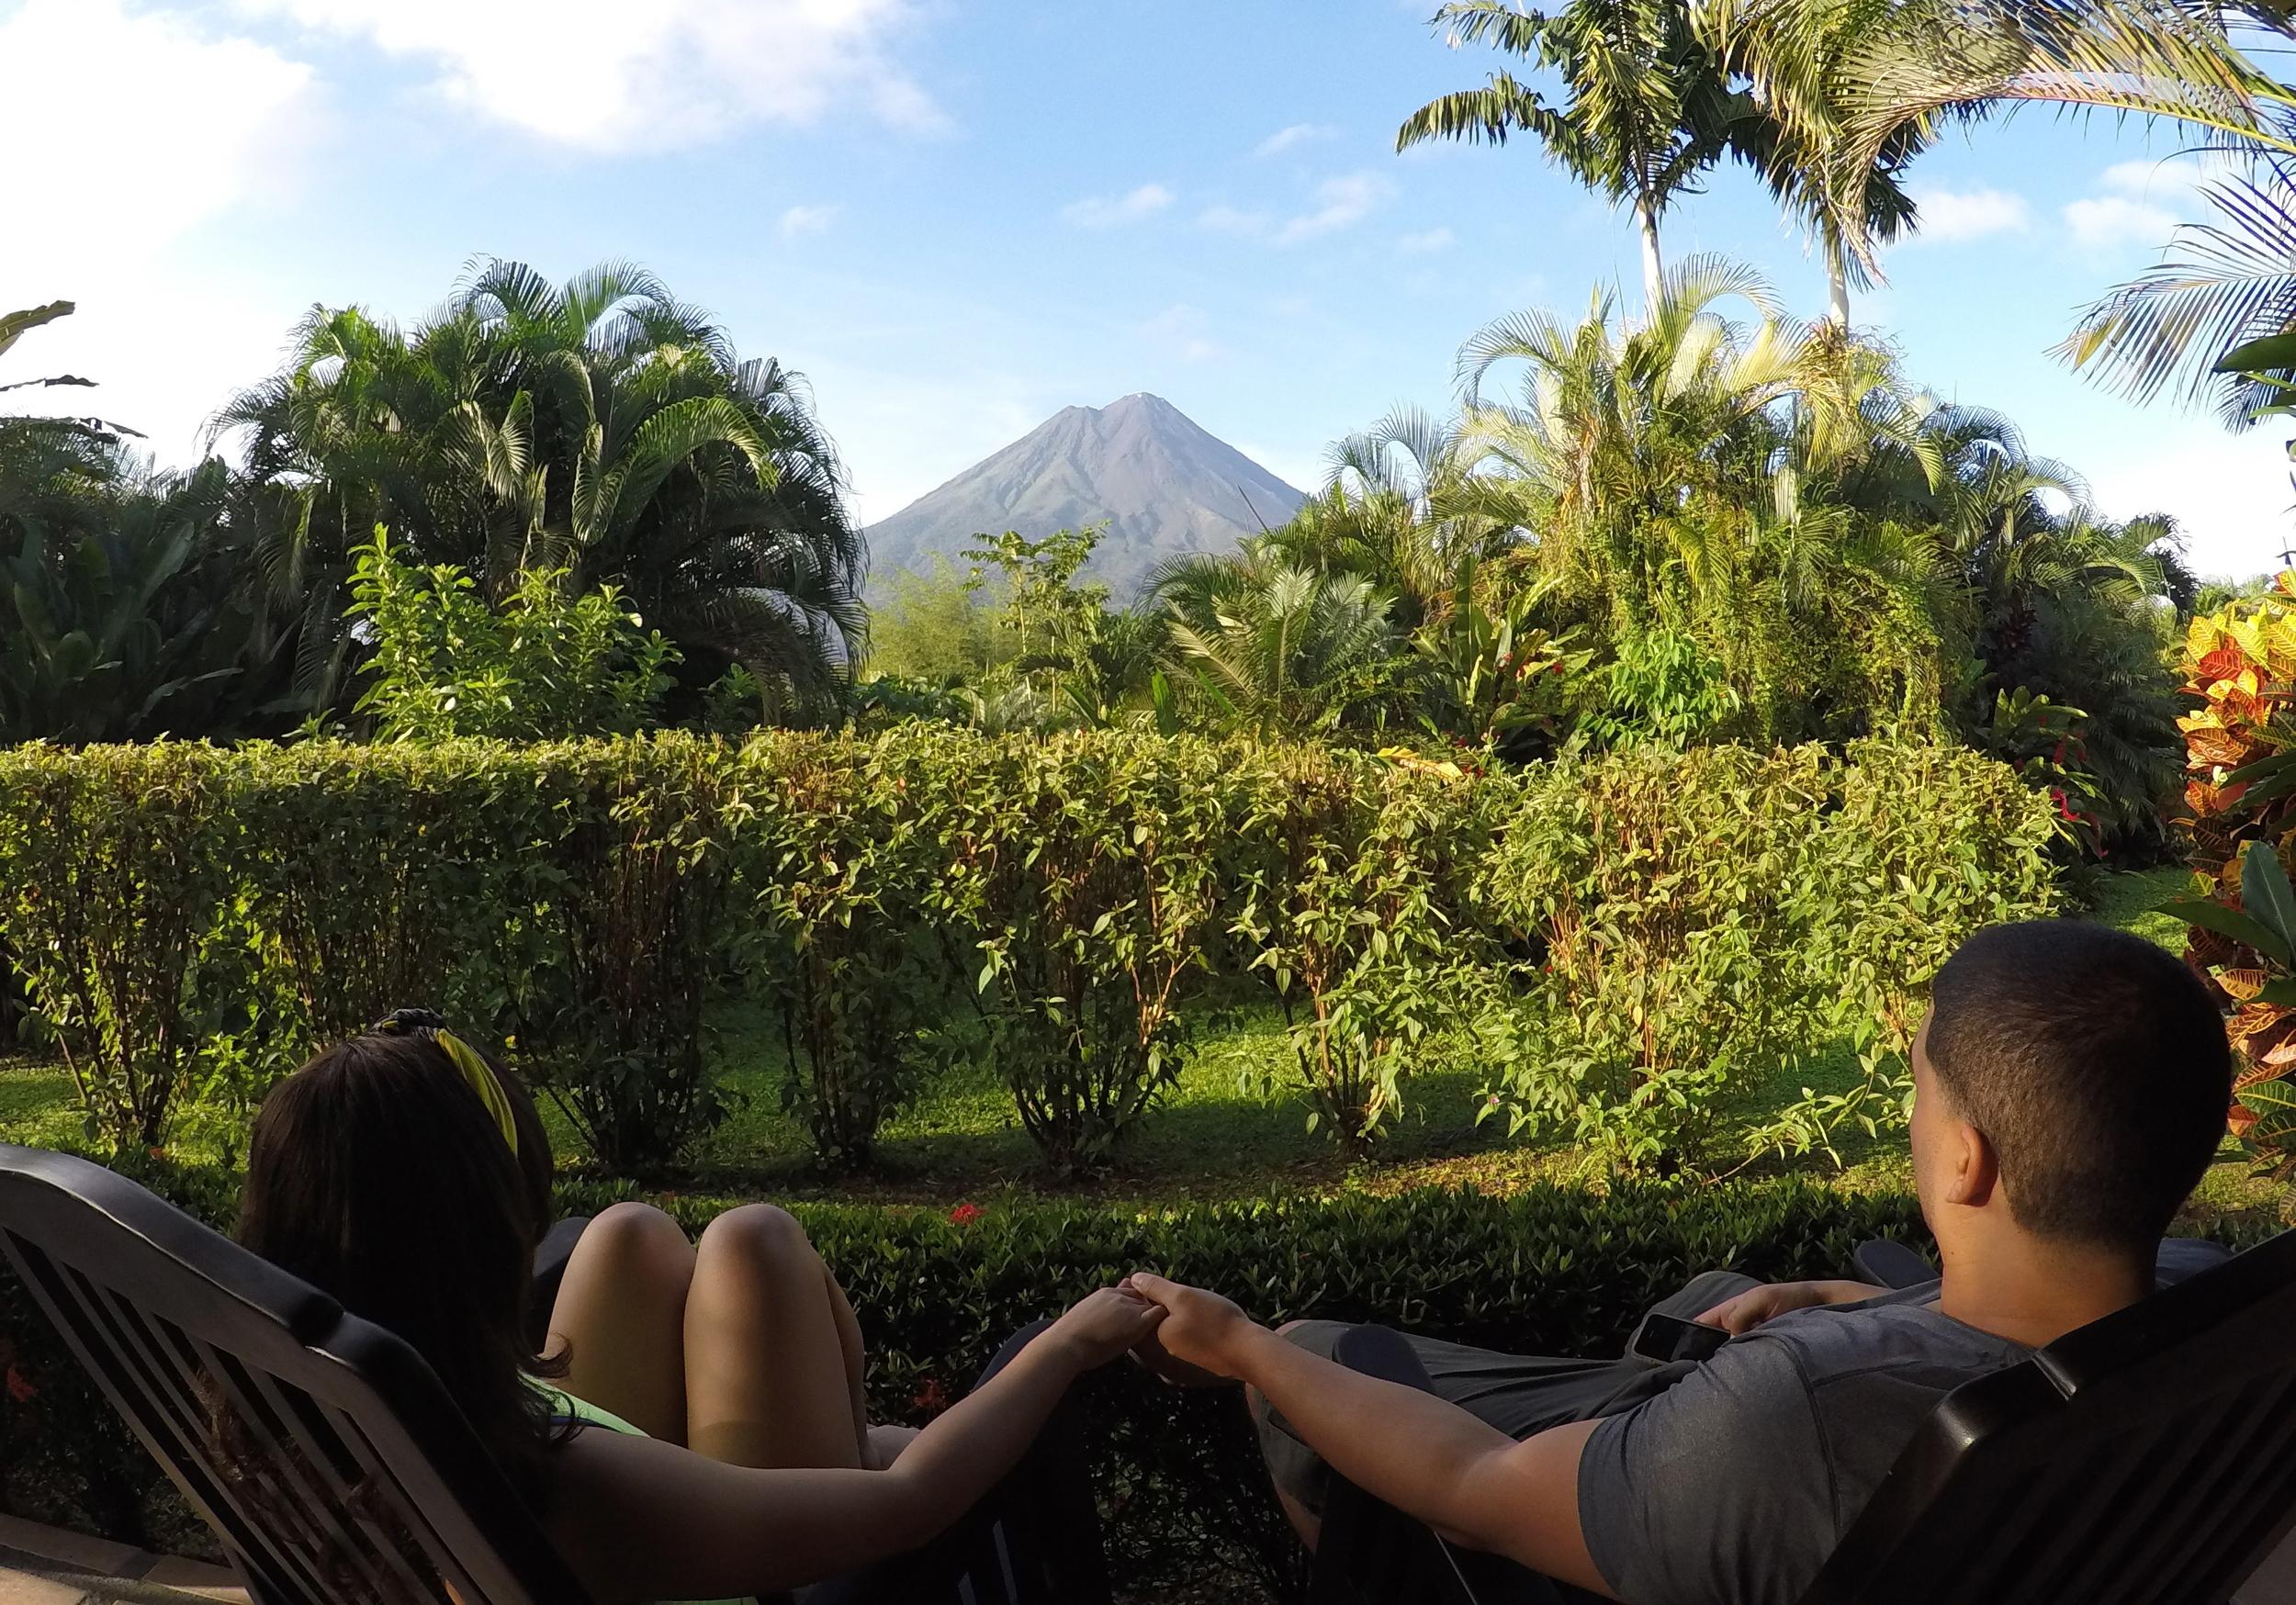 Volcano Views in Costa Rica!